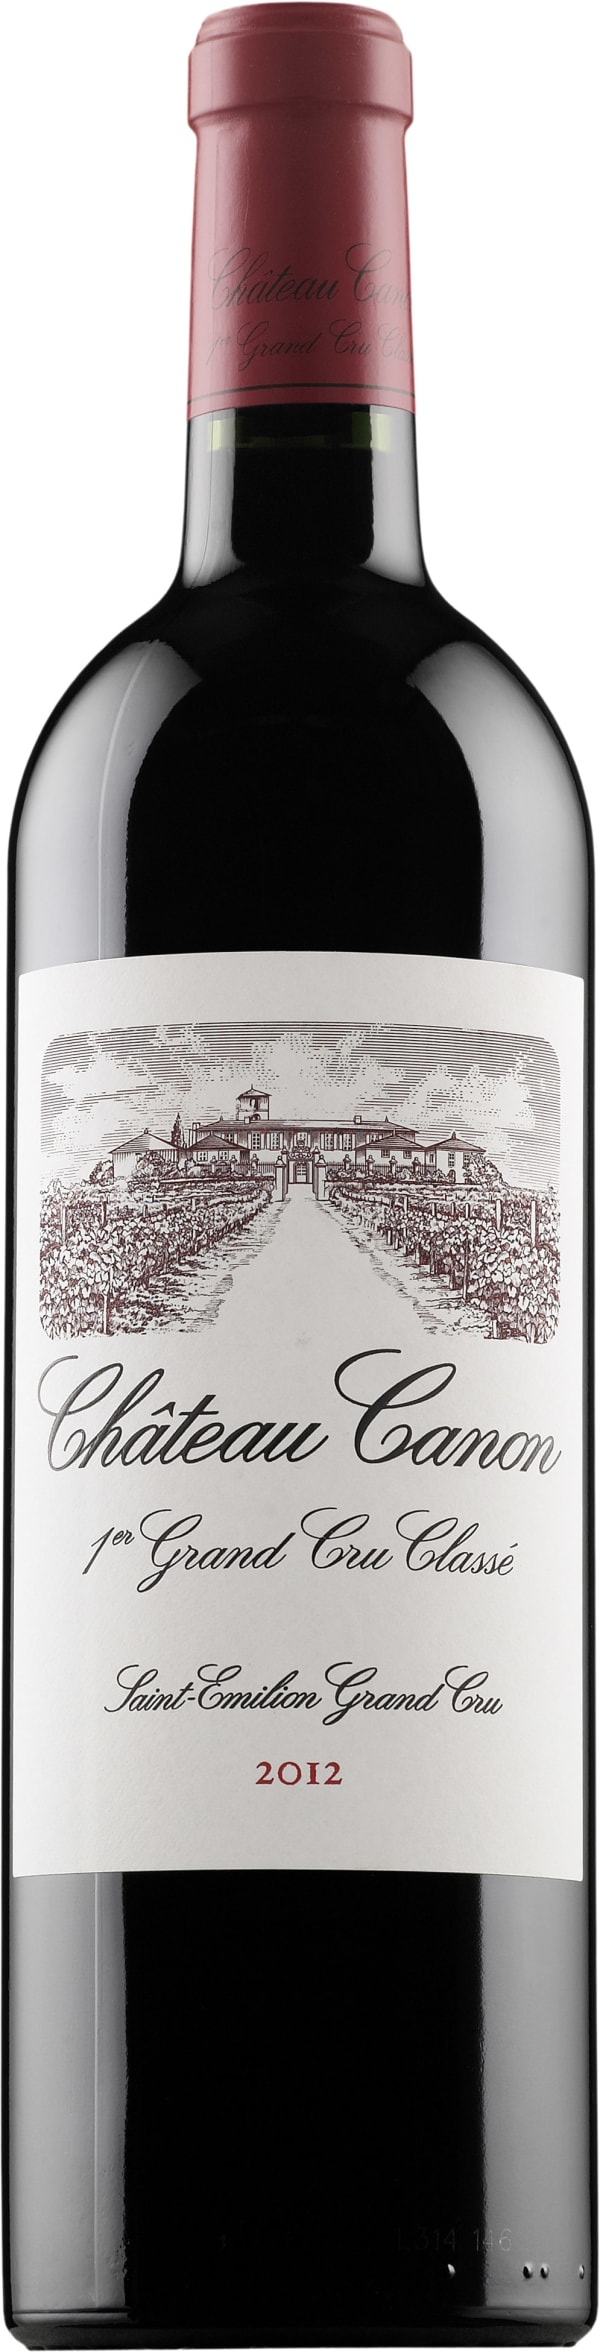 Château Canon 2012